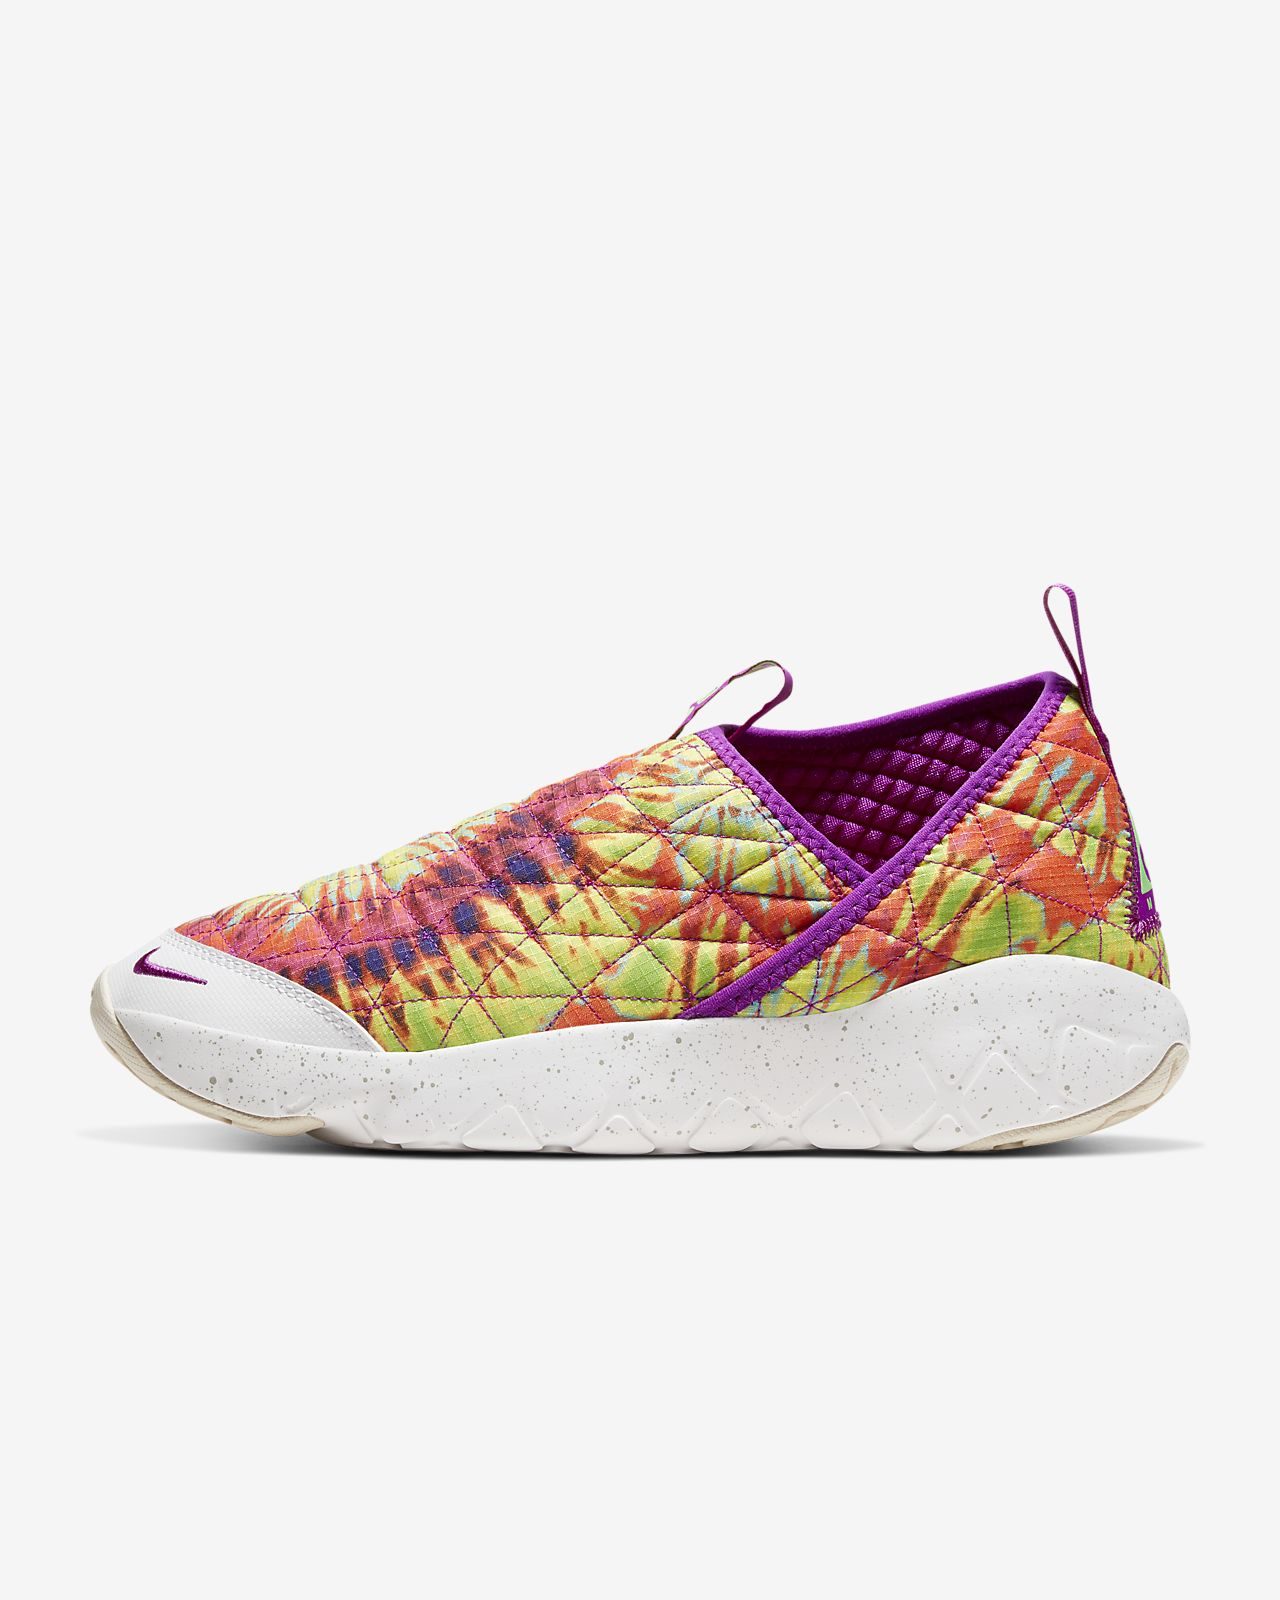 Nike ACG MOC 3.0 Schuh